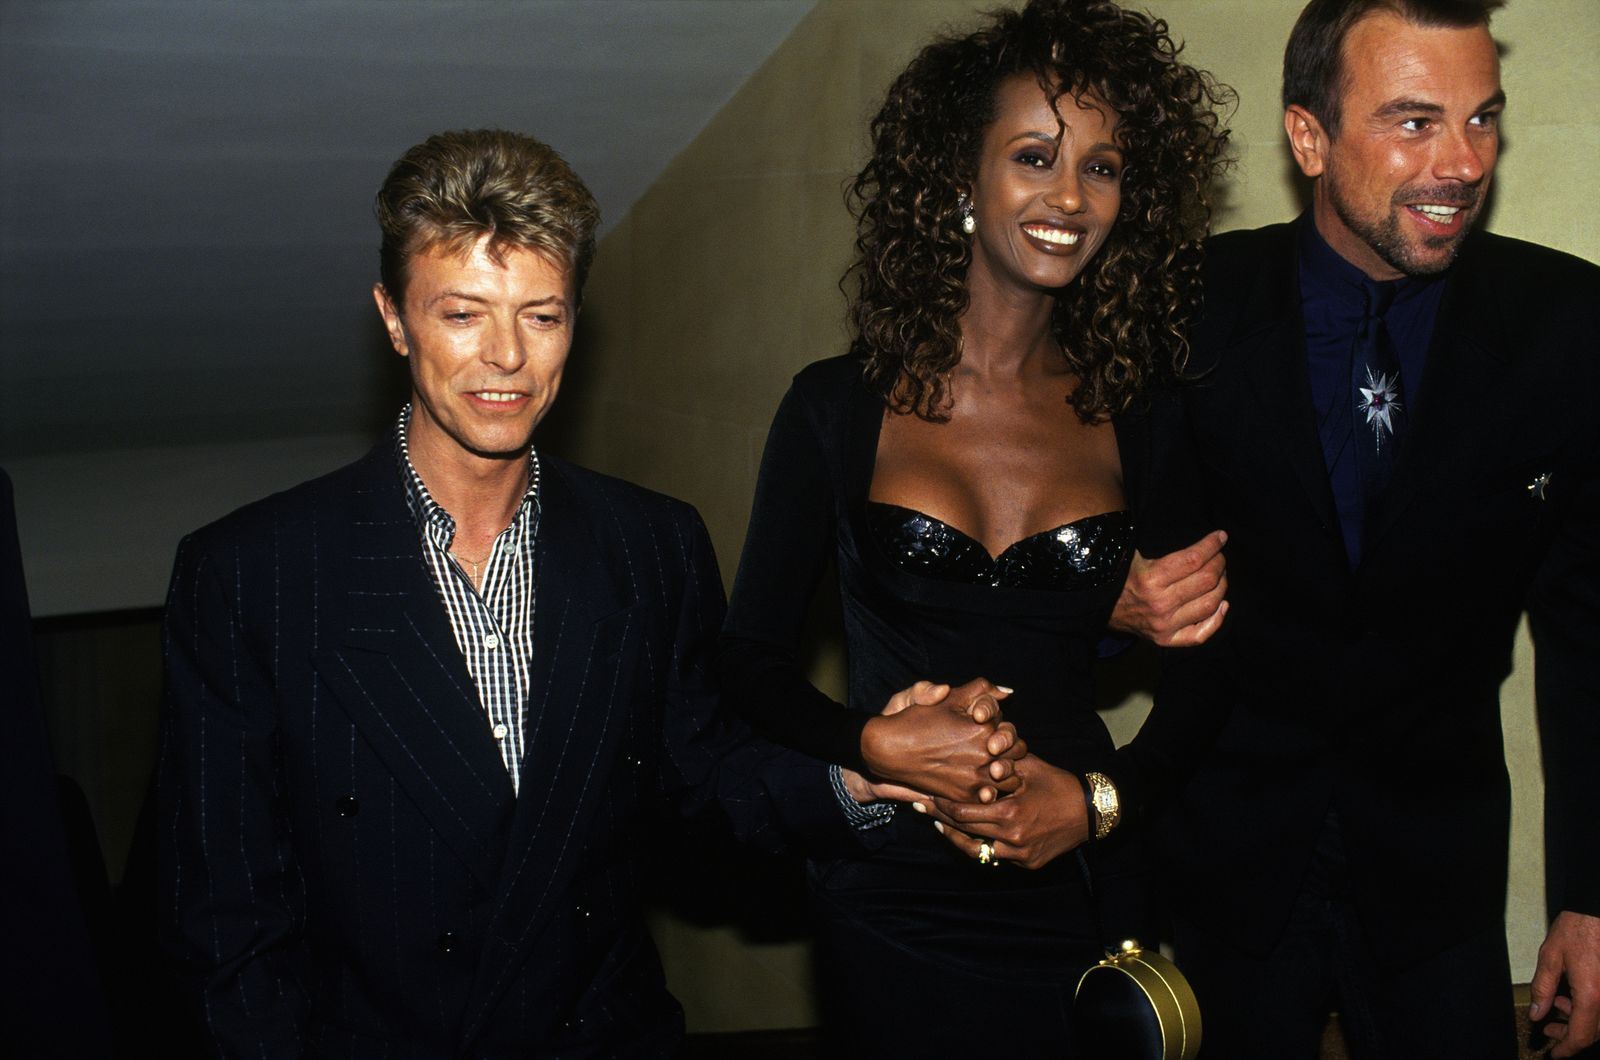 David Bowie With Top Model Iman And Thierry Mugler At Fete De La Musique